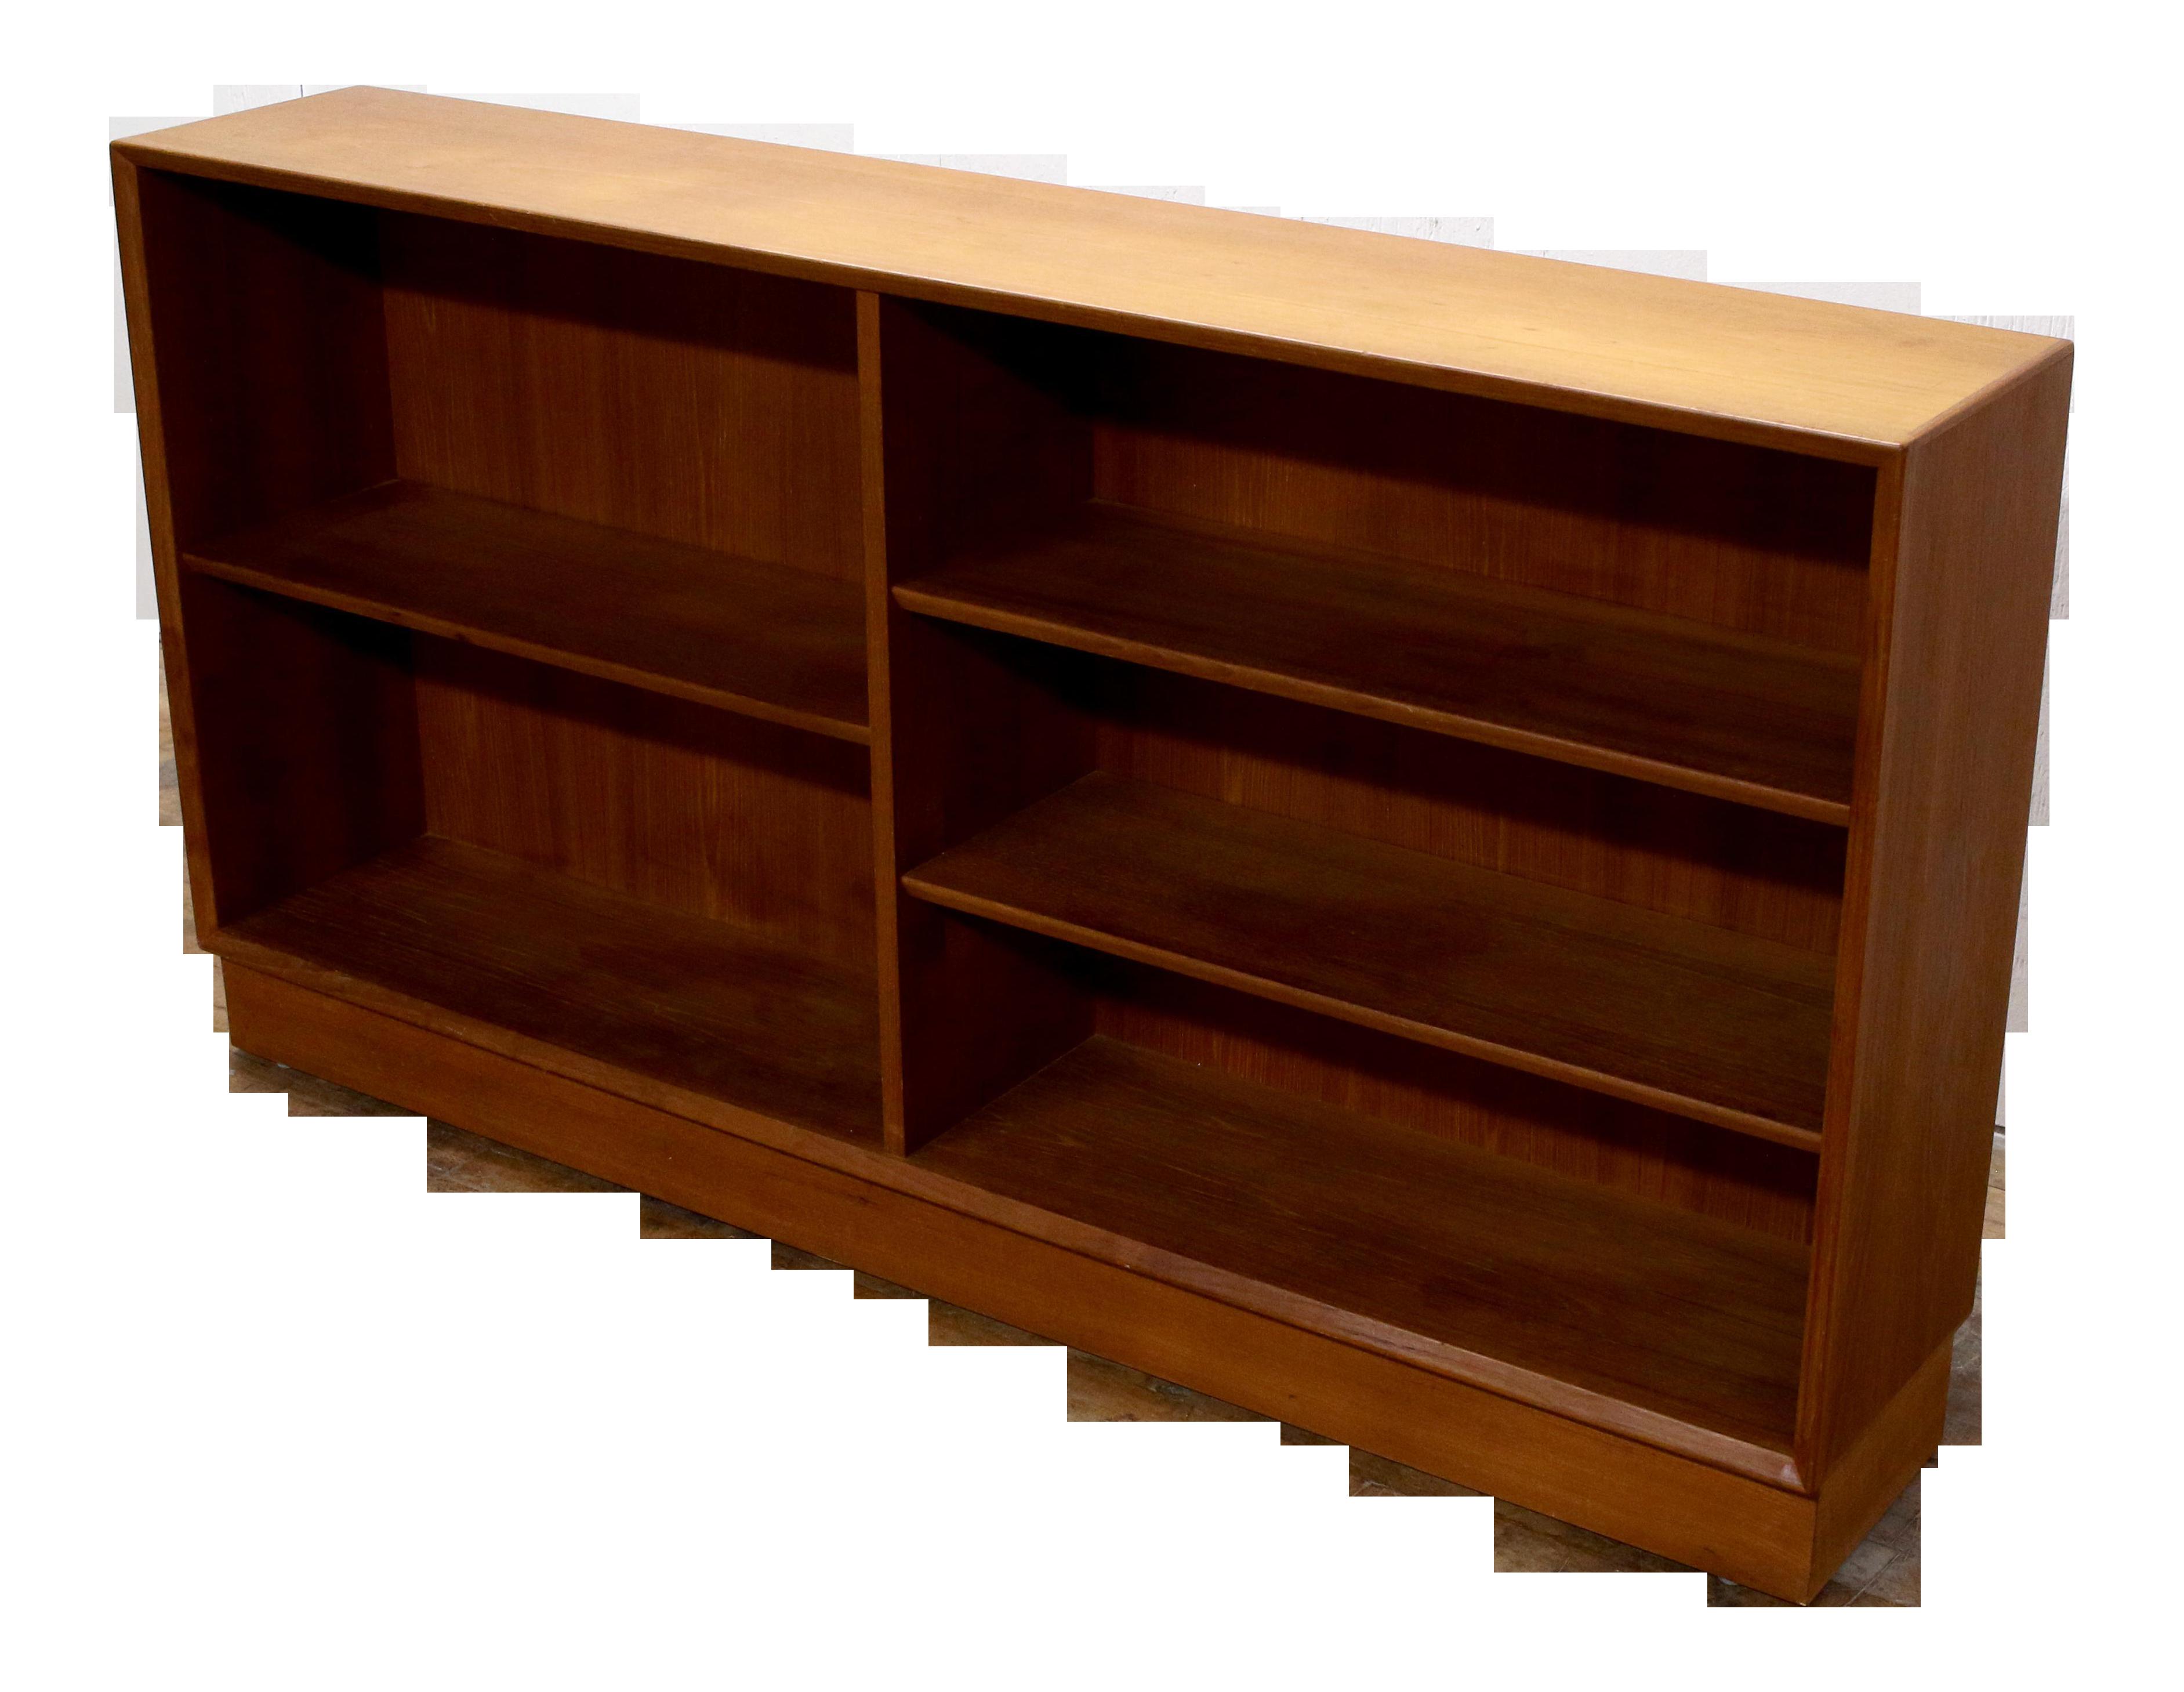 Image of: 1960s Danish Modern Solid Teakwood Low Mid Century Modern Bookcase Cabinet 2 Chairish